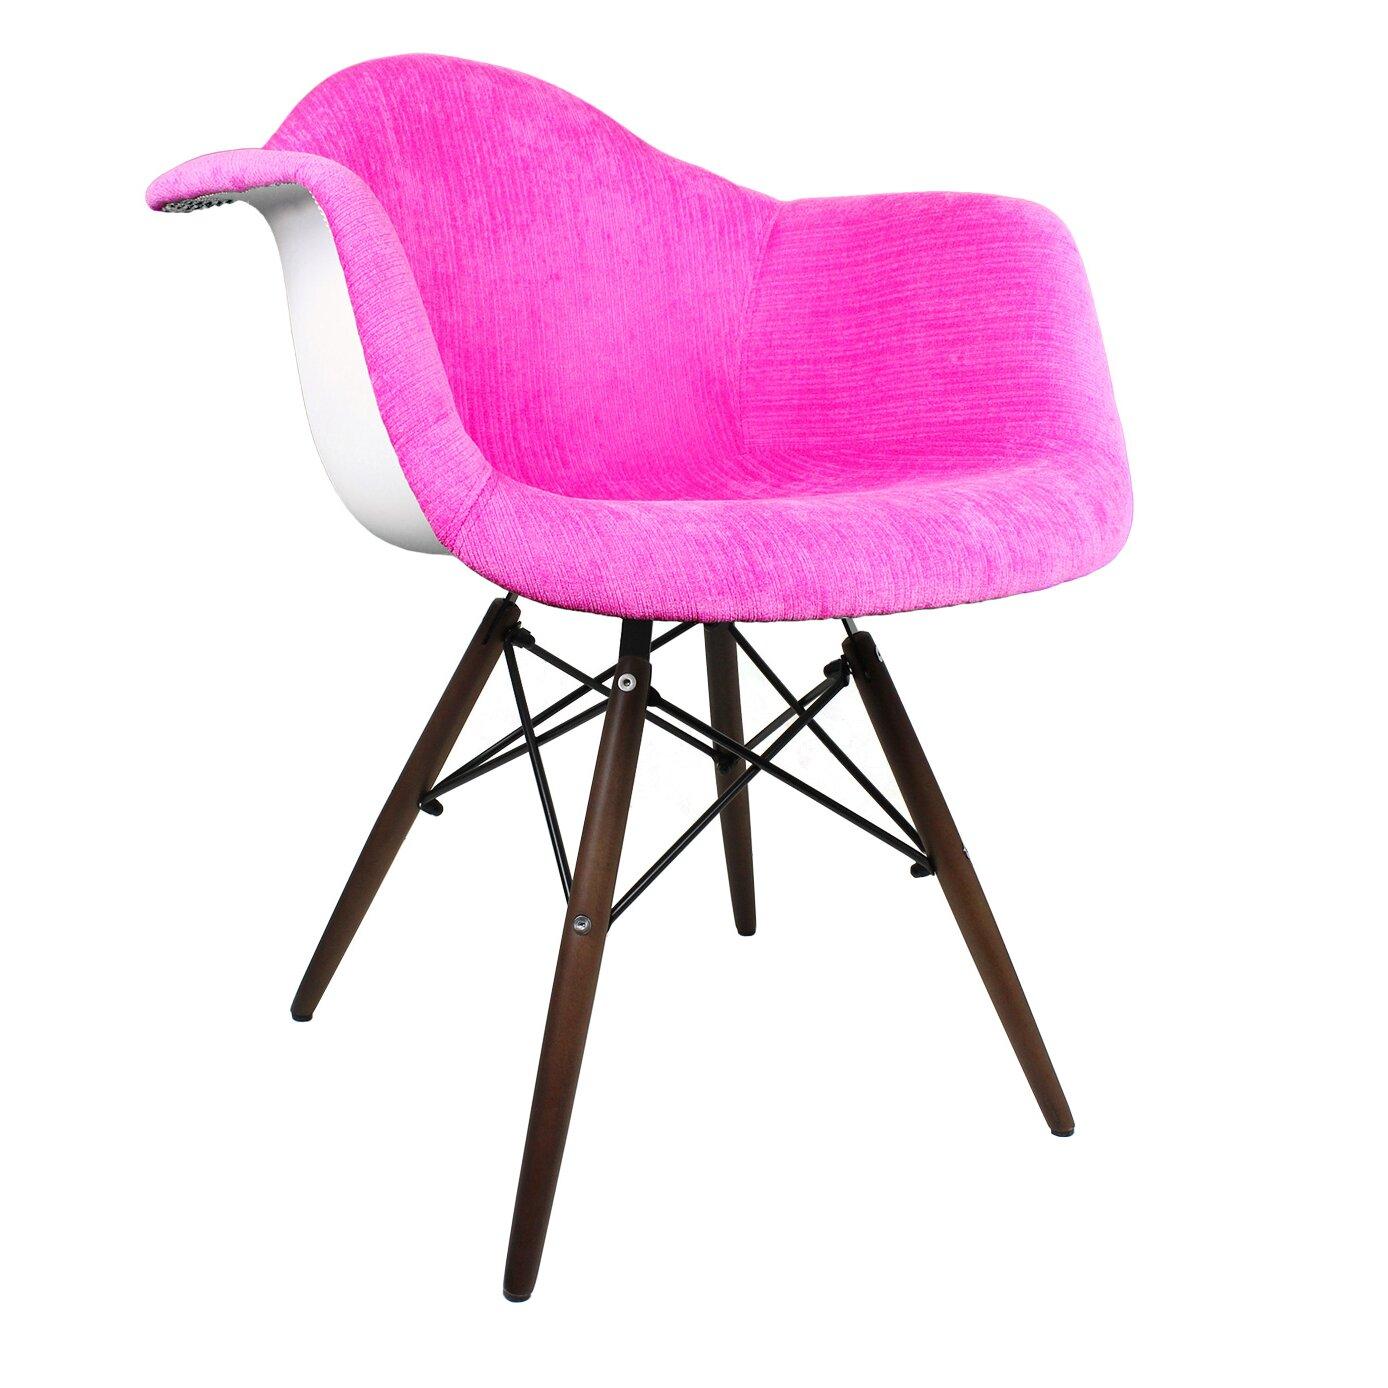 Emodern decor velvet fabric arm chair with wood legs for Emodern decor